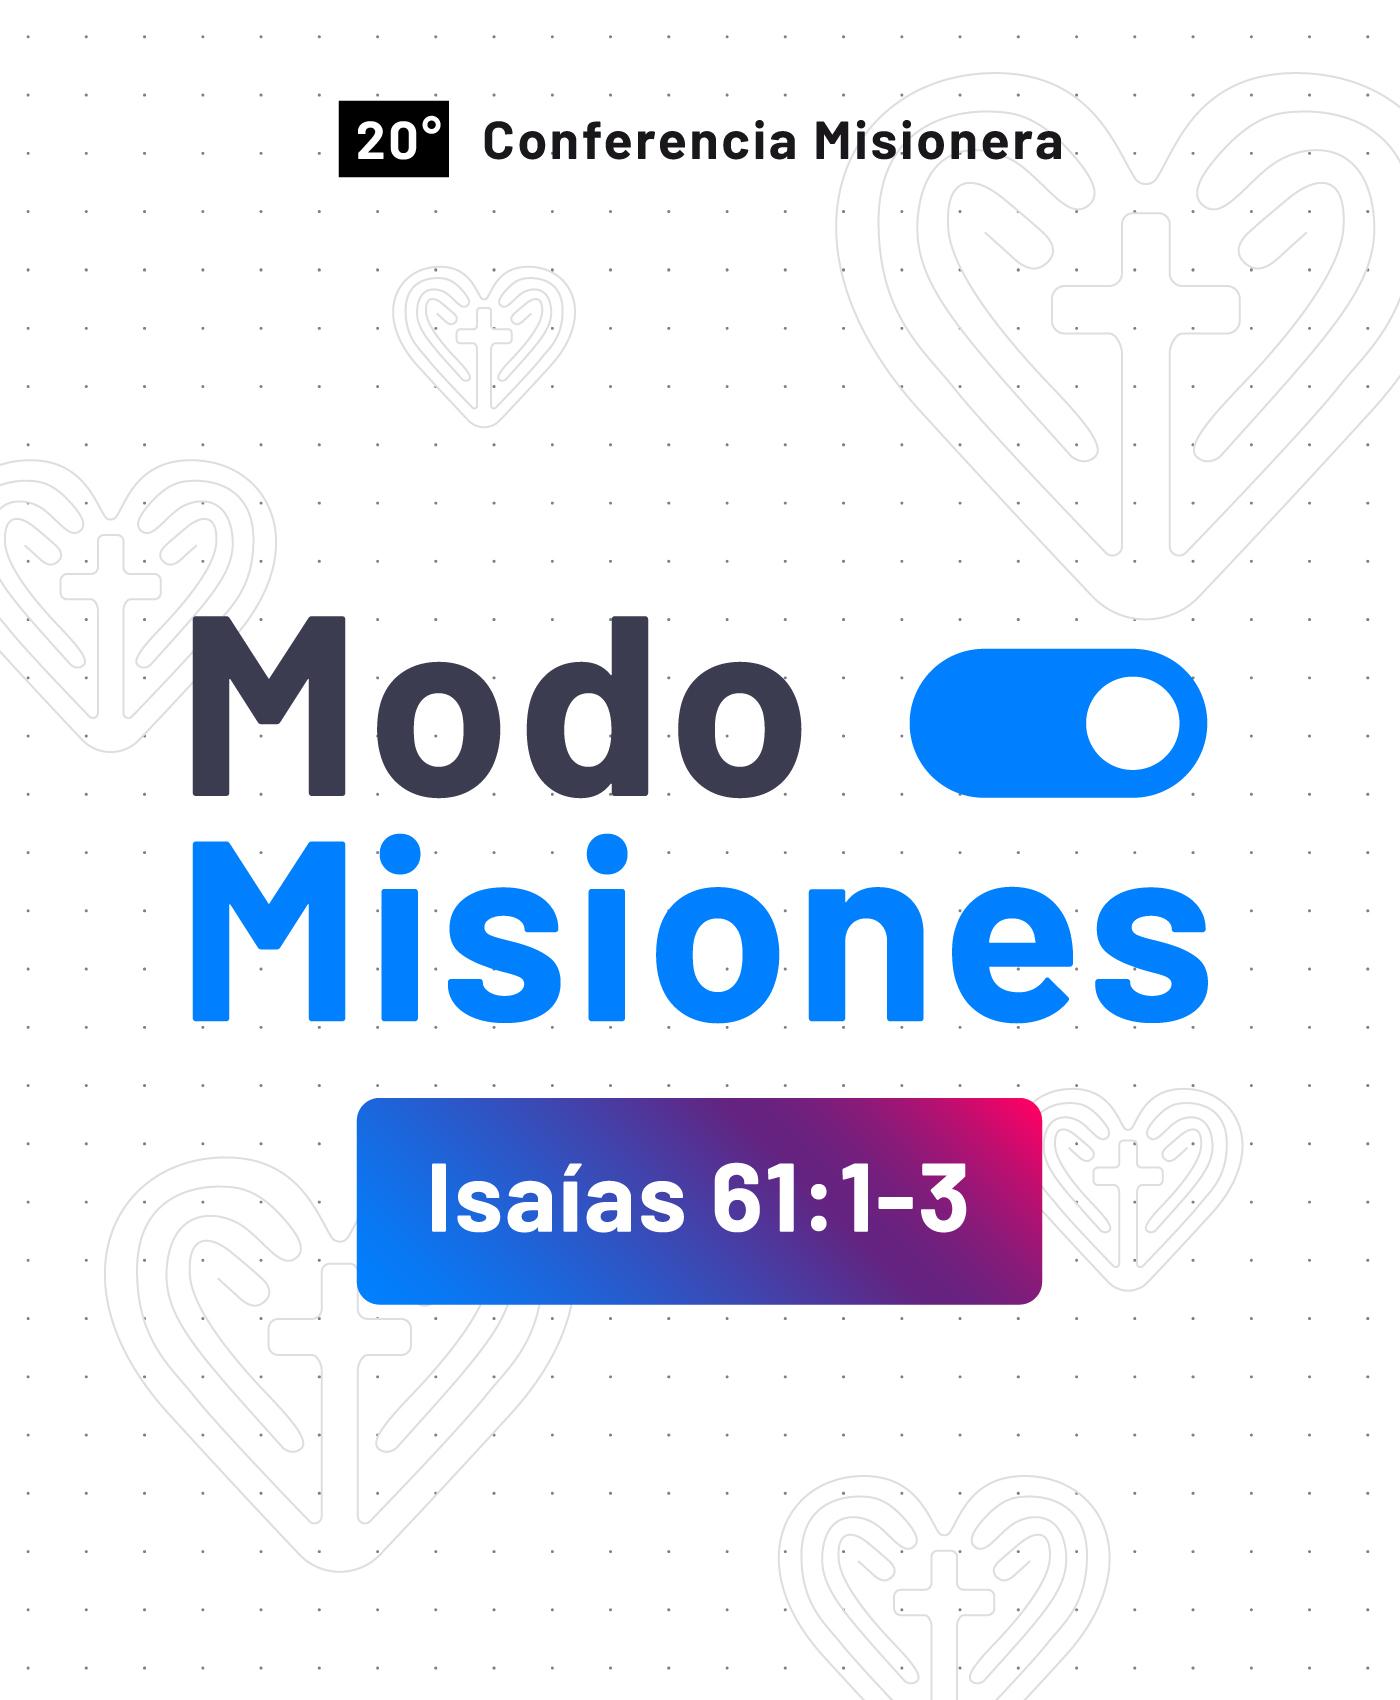 Modo Misiones